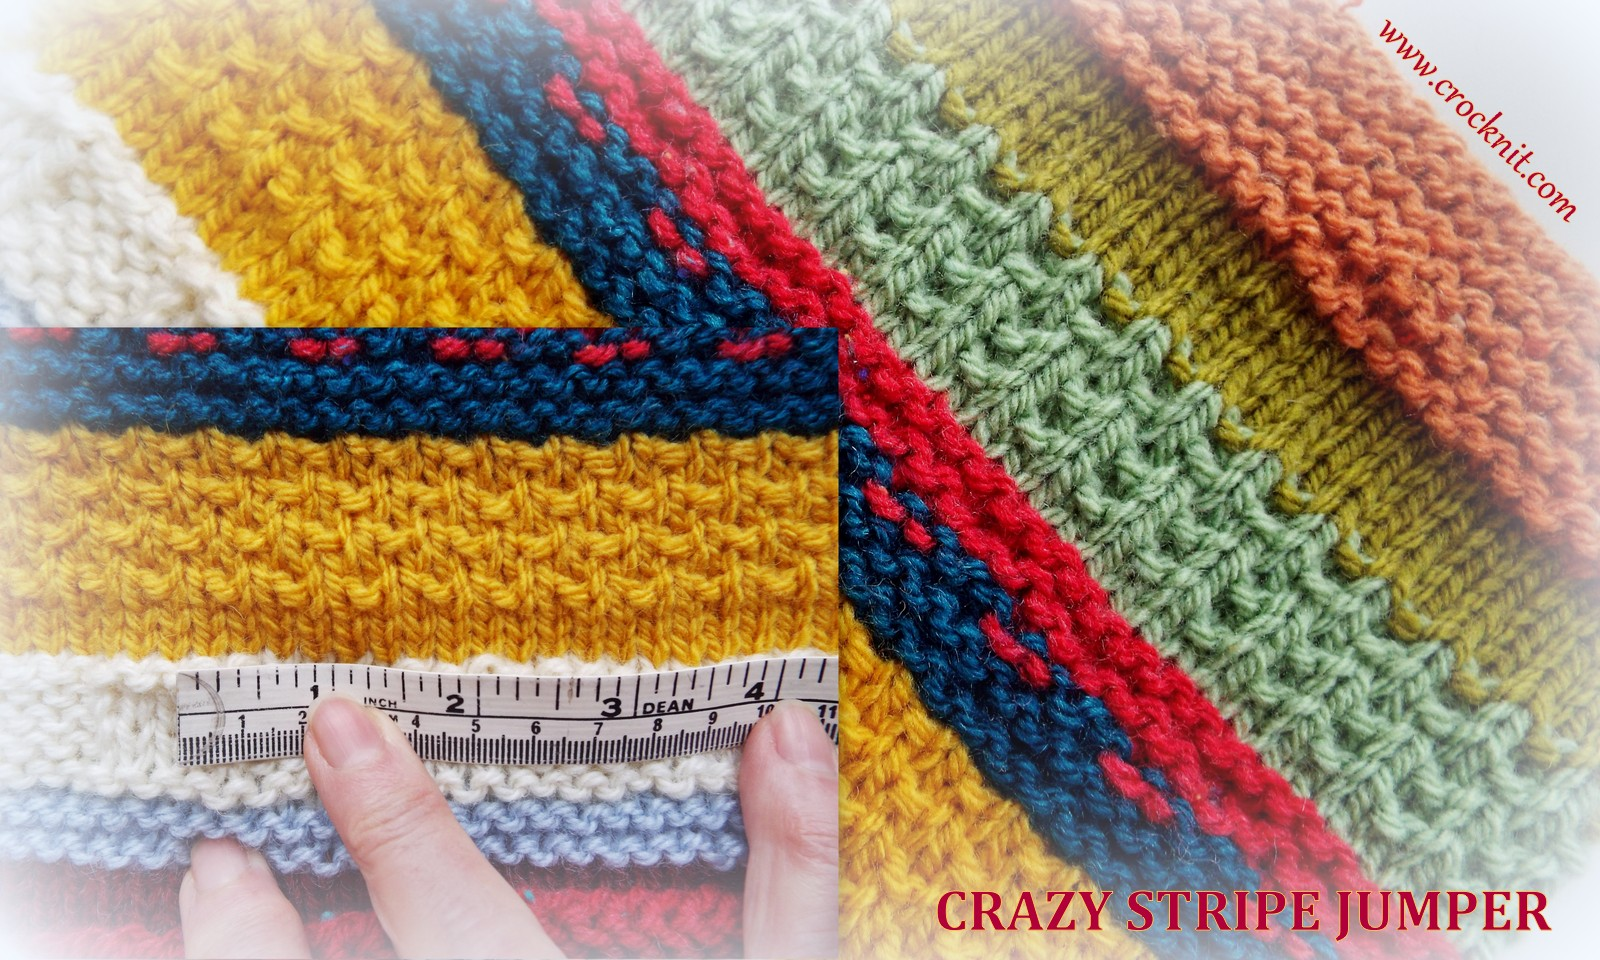 MICROCKNIT CREATIONS: Knit me a CRAZY STRIPE JUMPER